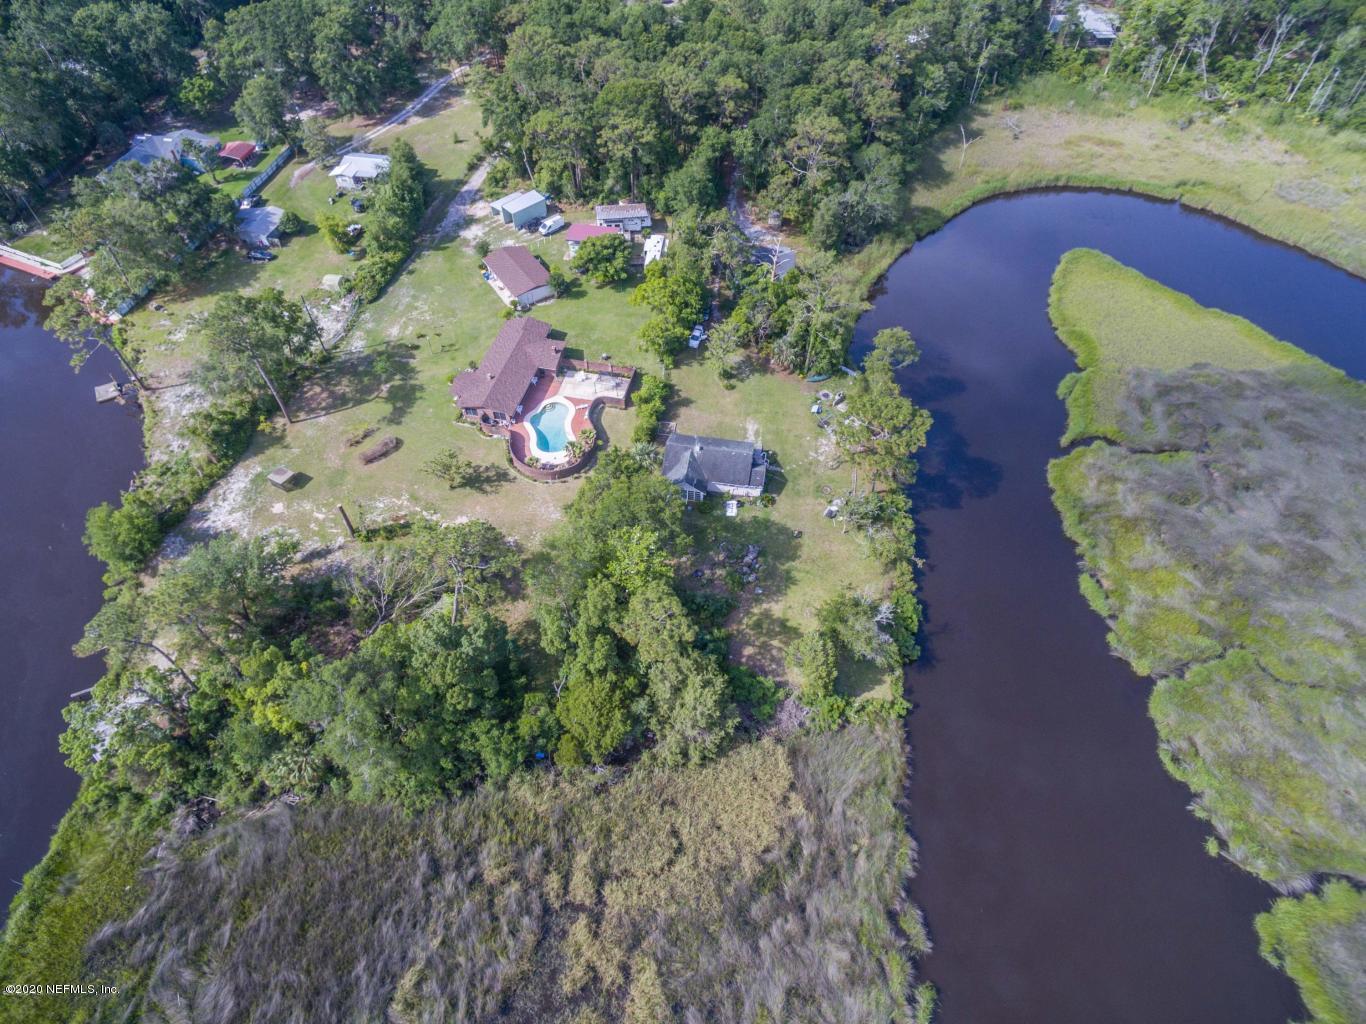 11450 KELLEY ACRES, JACKSONVILLE, FLORIDA 32218, 3 Bedrooms Bedrooms, ,3 BathroomsBathrooms,Residential,For sale,KELLEY ACRES,1055631